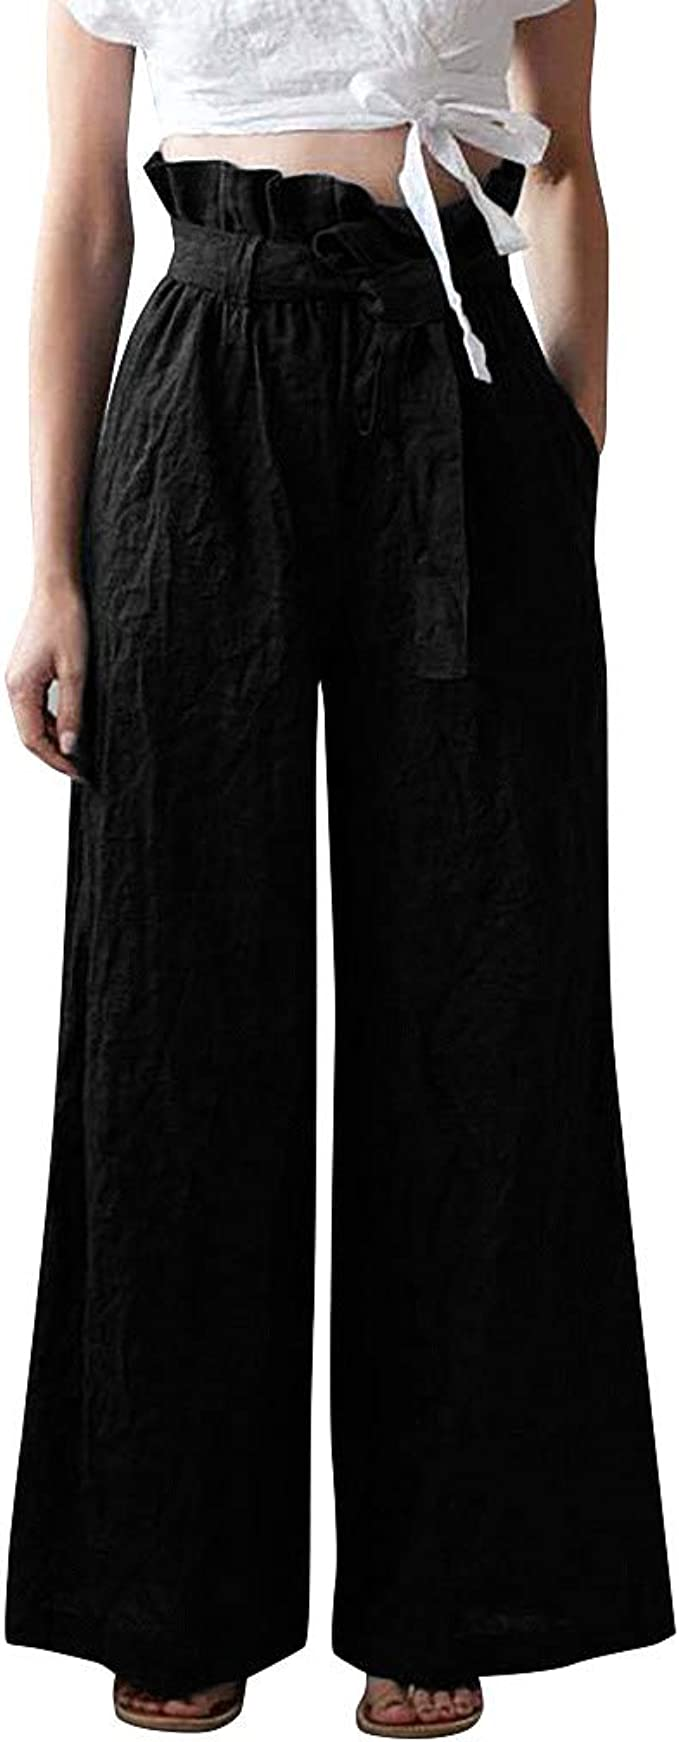 Washed Linen Pants Linen Clothing Linen Pants for Women Loose Linen Pants Wide Leg Linen Pants Linen Palazzo Pants Summer Linen Pants